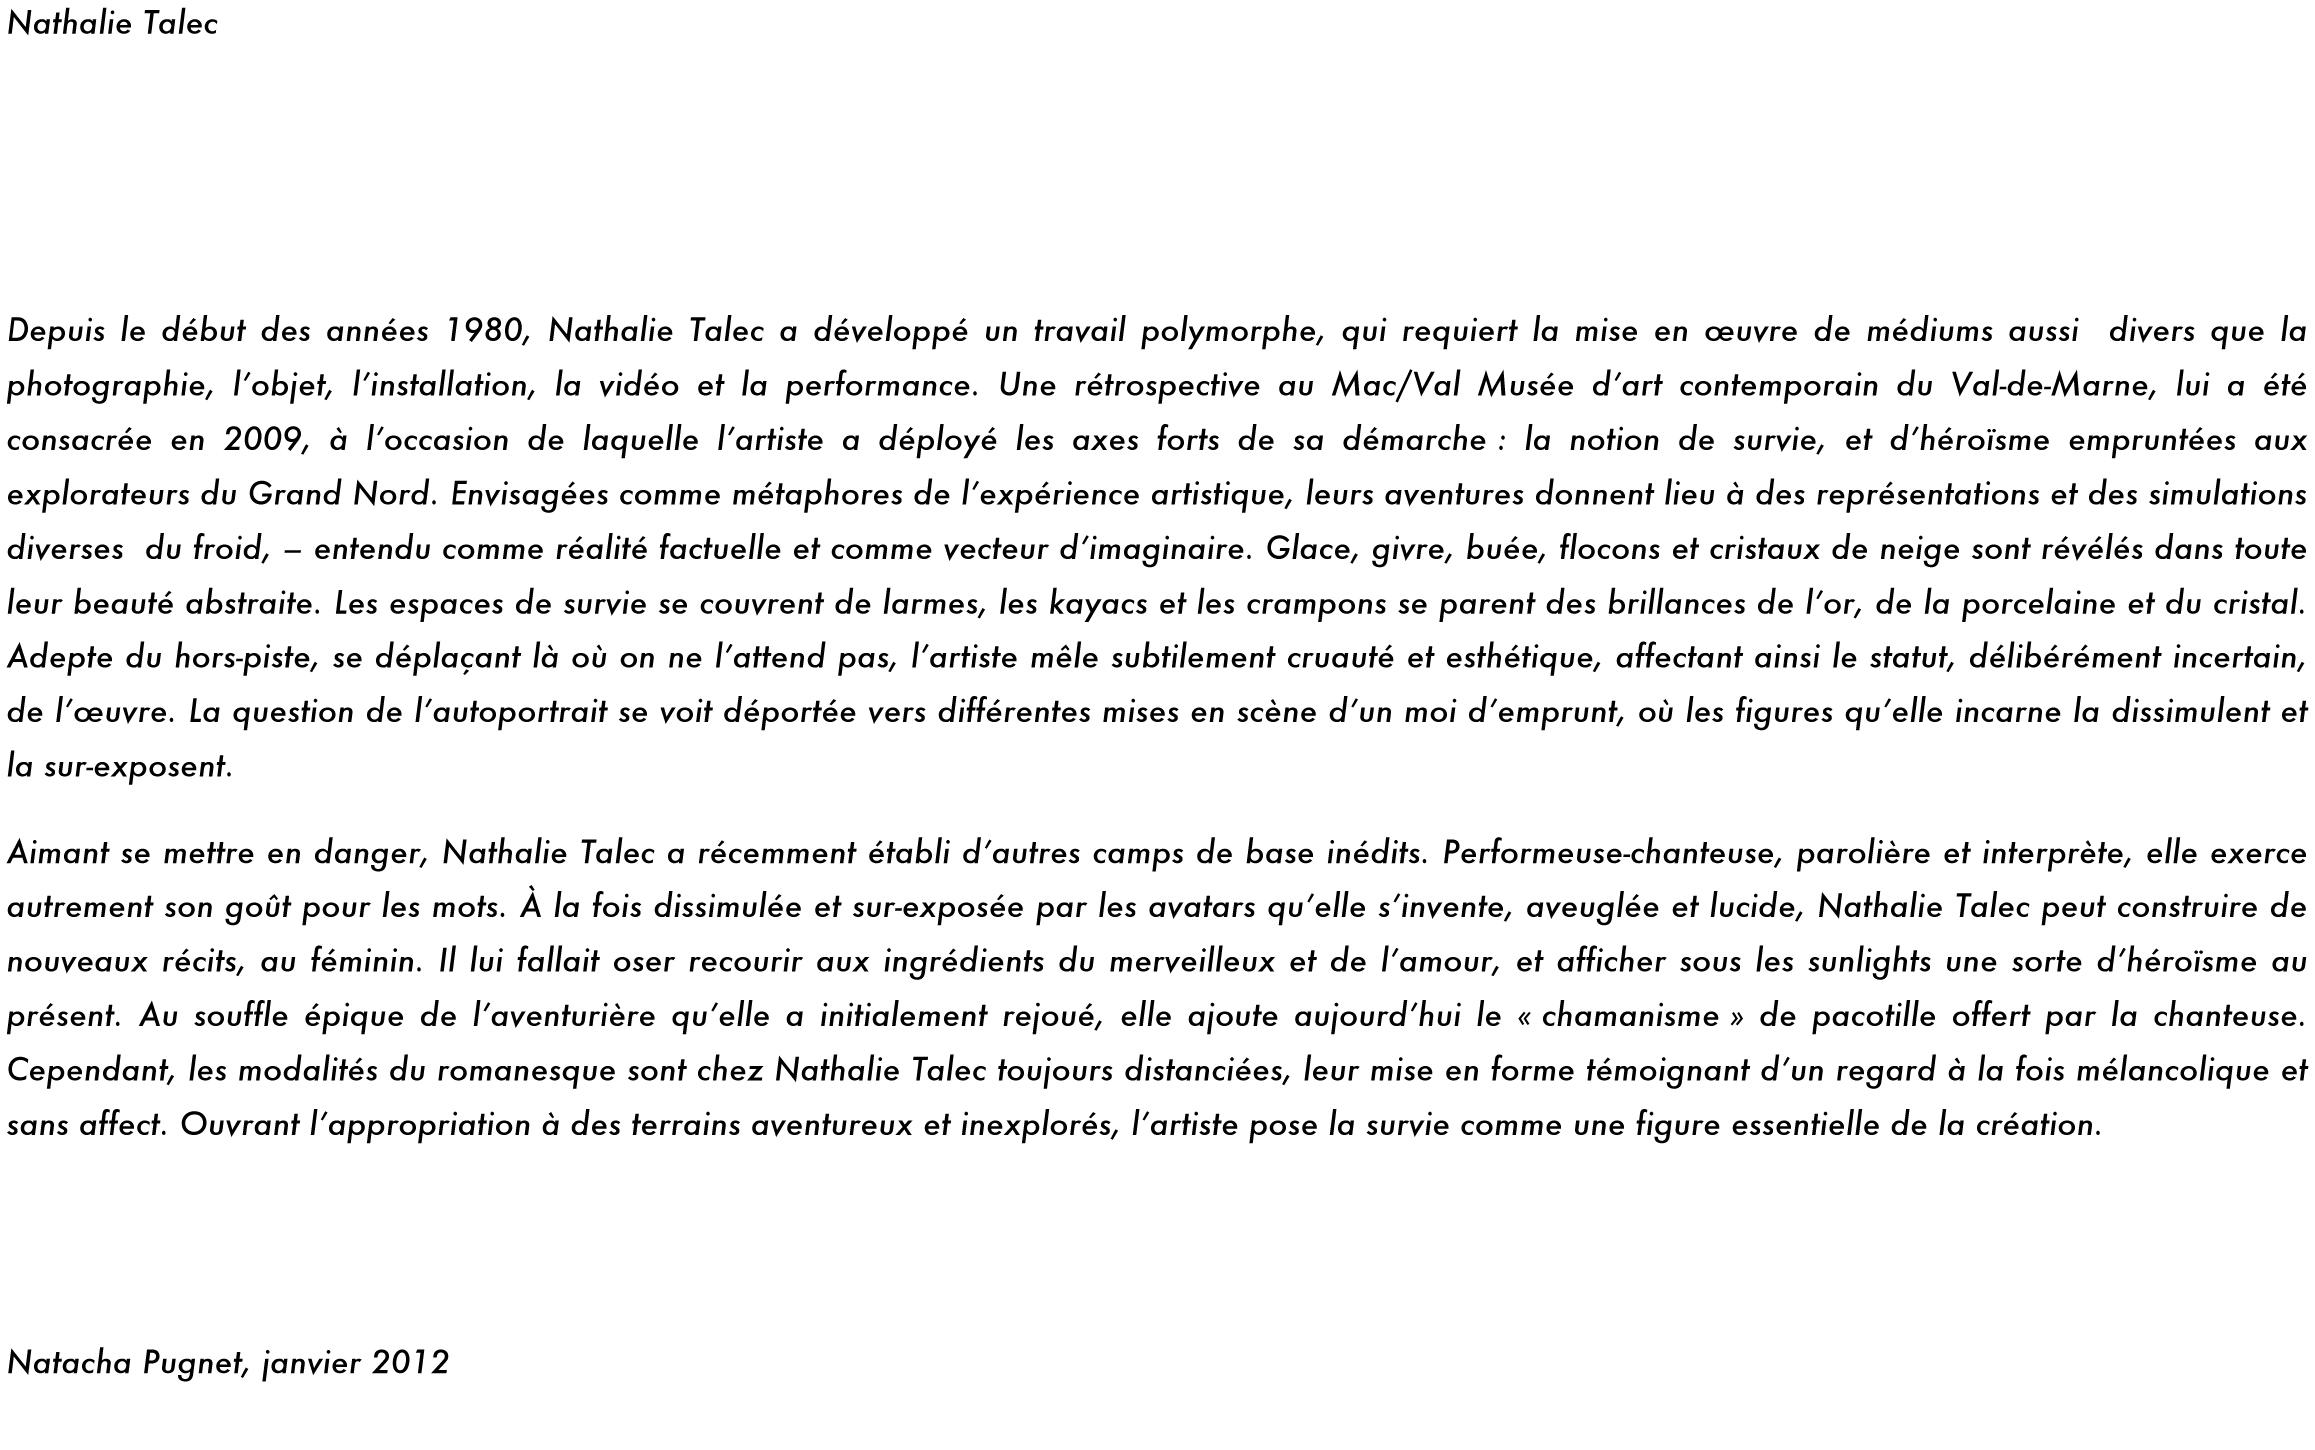 Microsoft Word - catalogue YBCA.doc